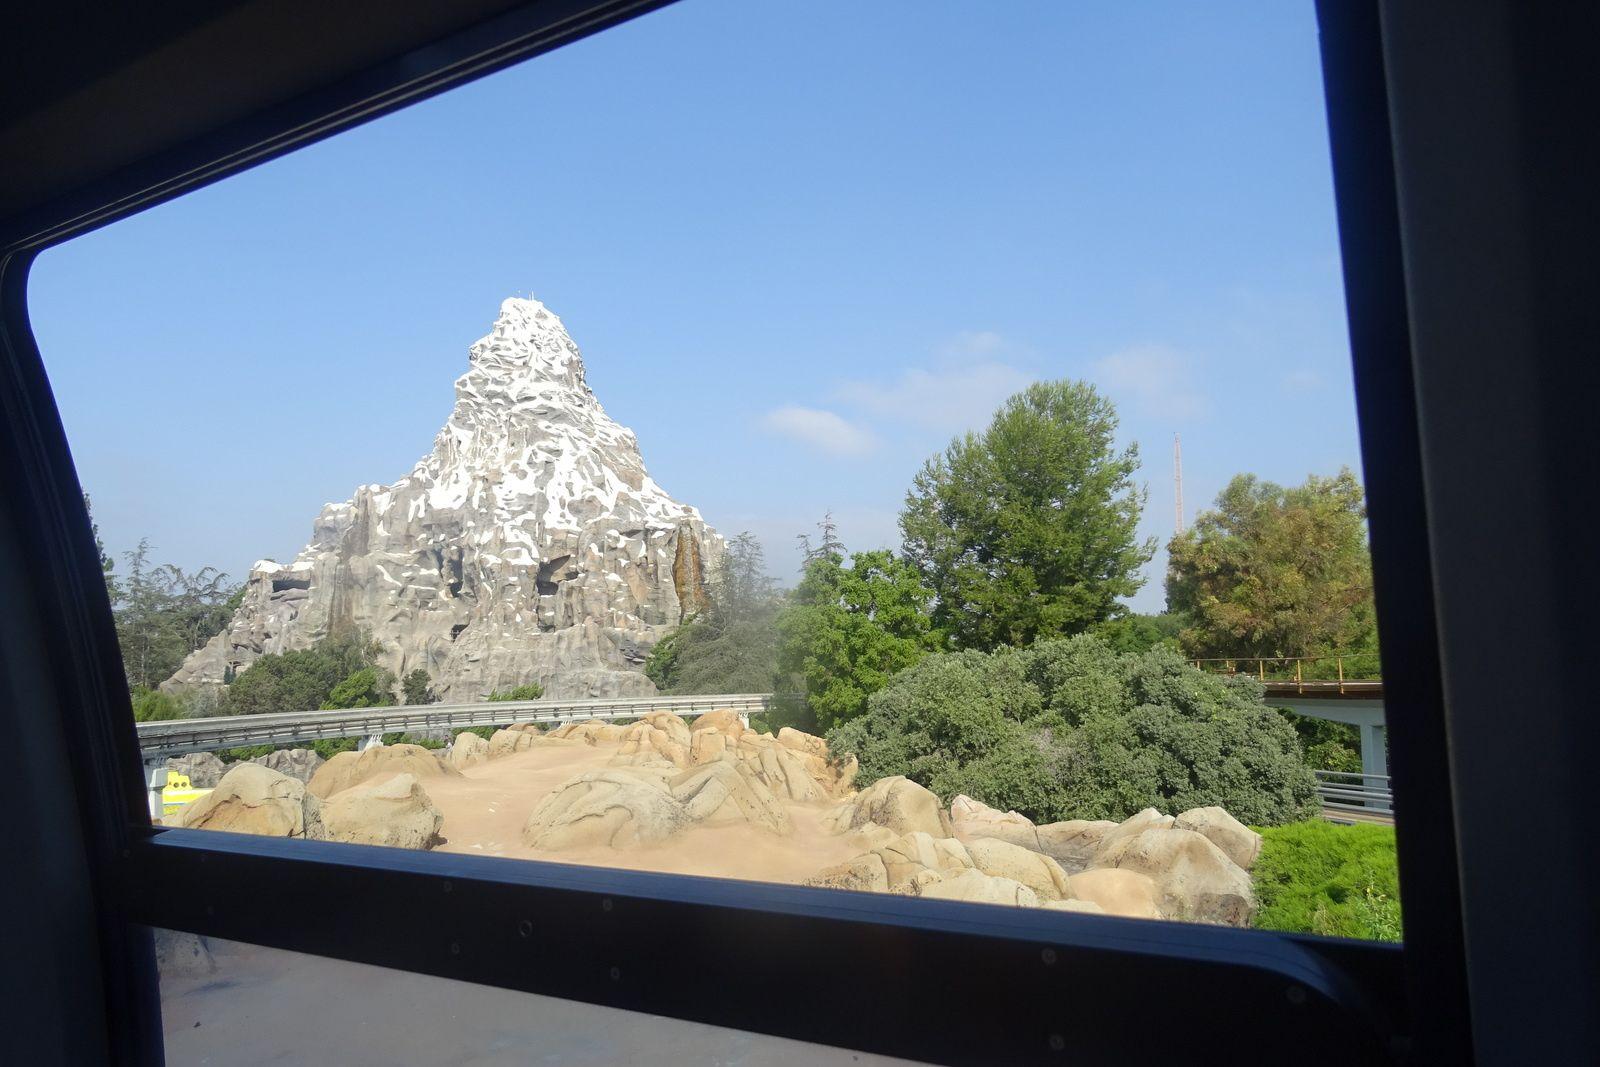 Le Monorail, Disneyland Resort (Californie)